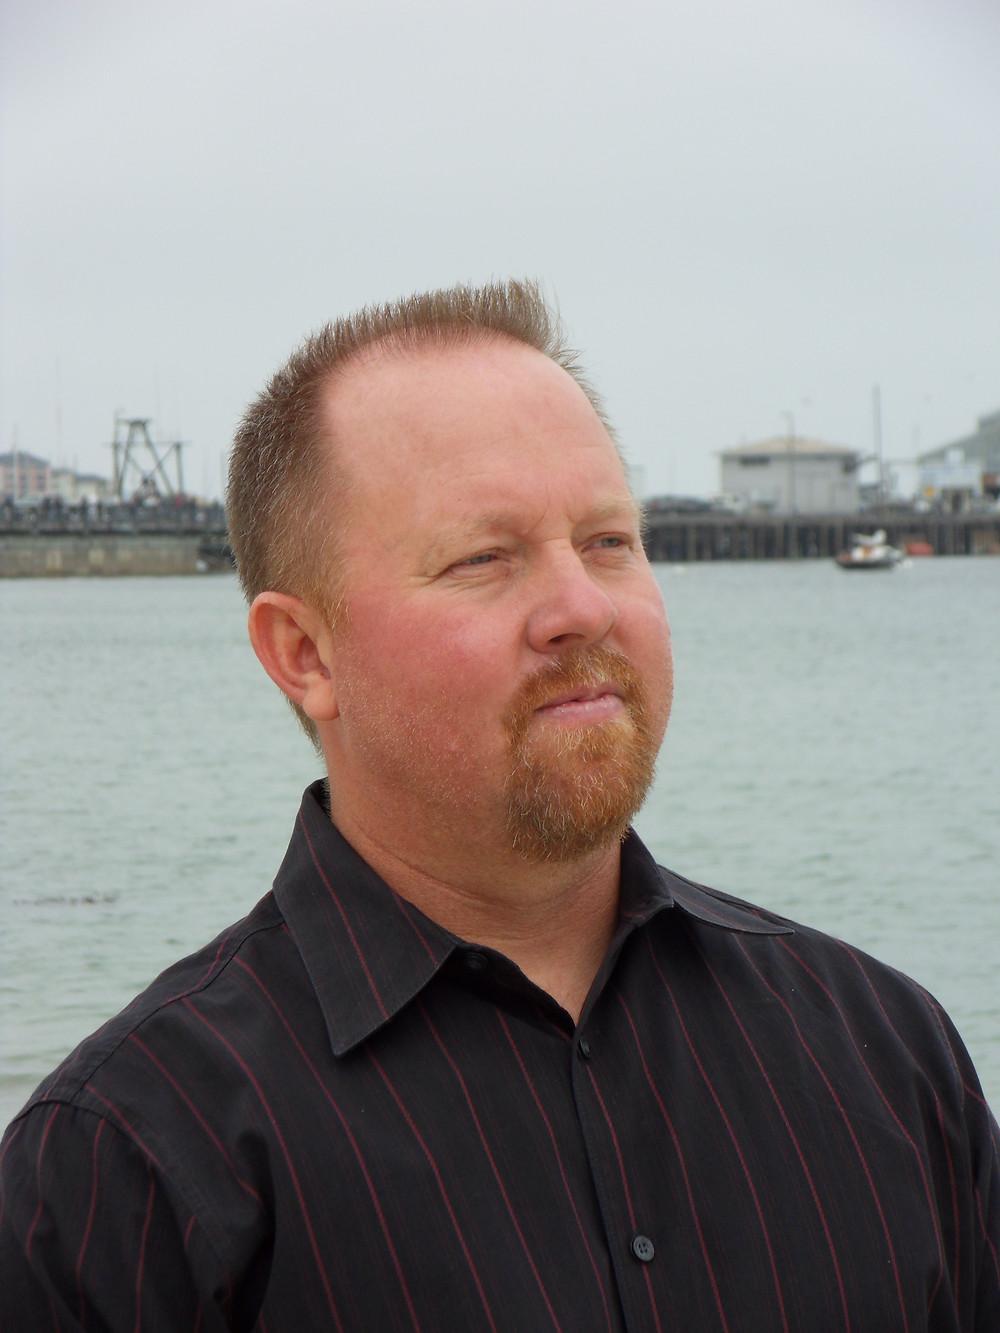 Allen Myhre Owner at California Custom Iron